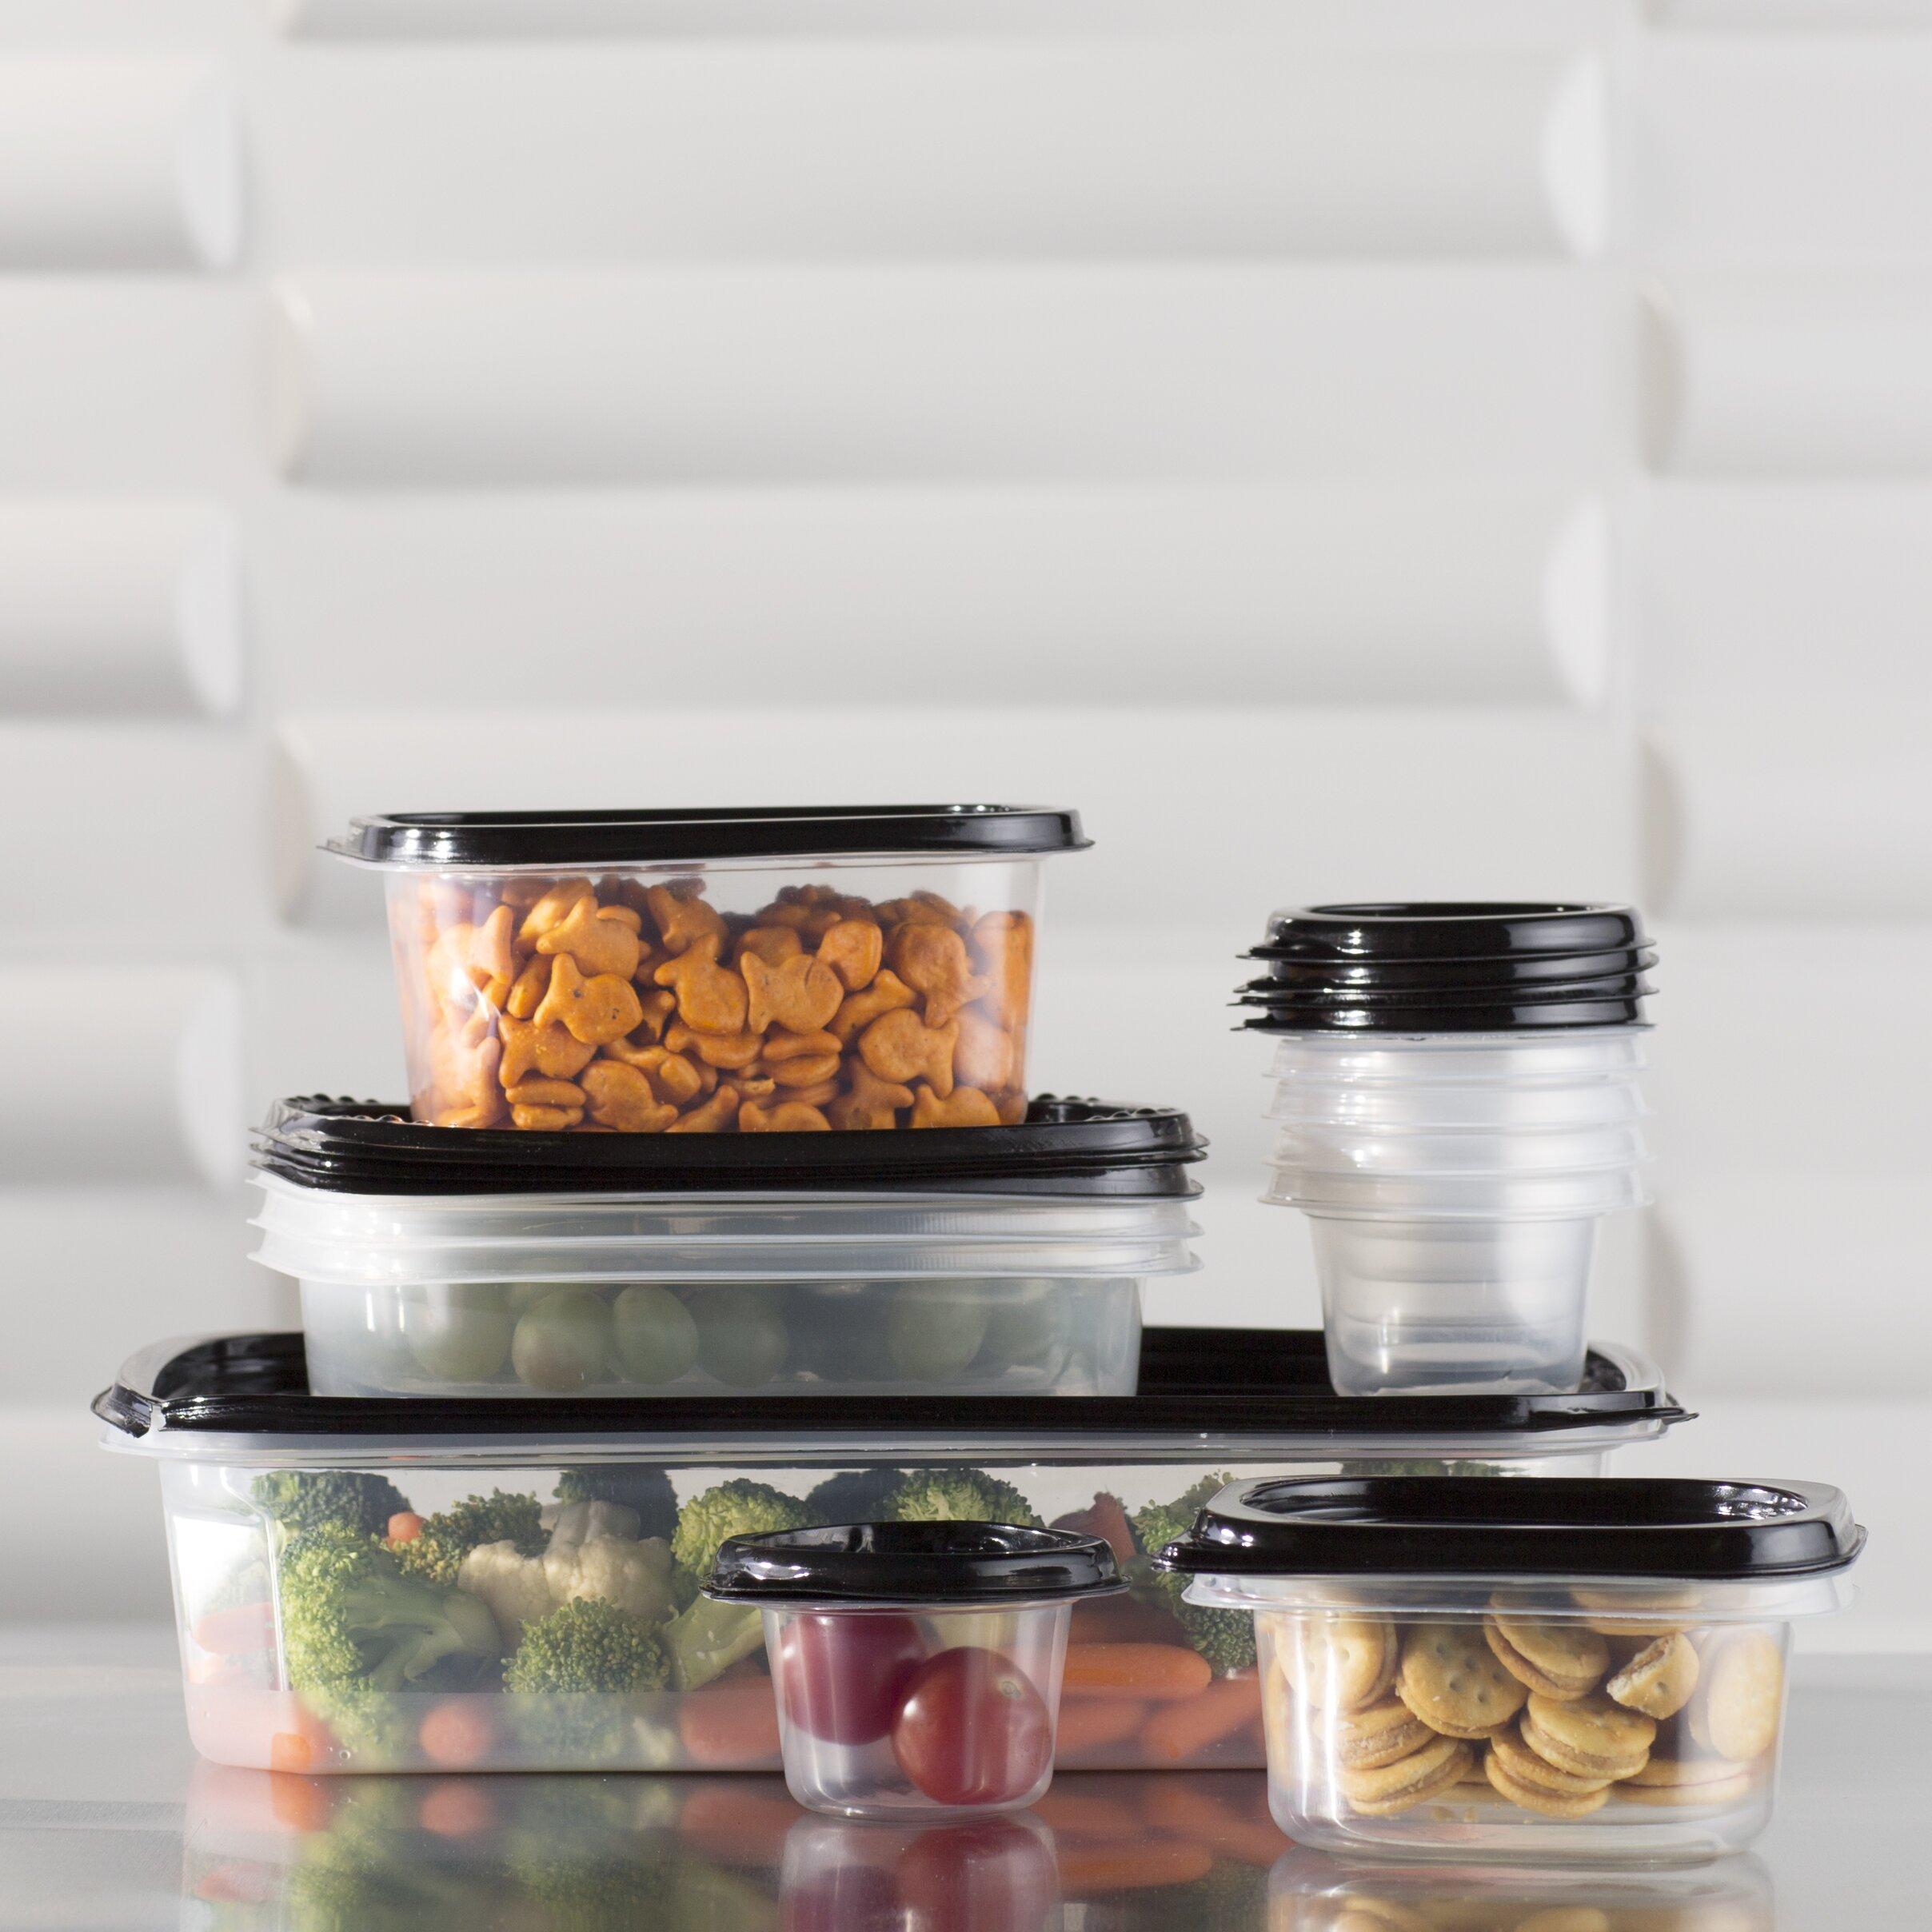 wayfair allmodern - wayfair basics piece plastic food storage container set